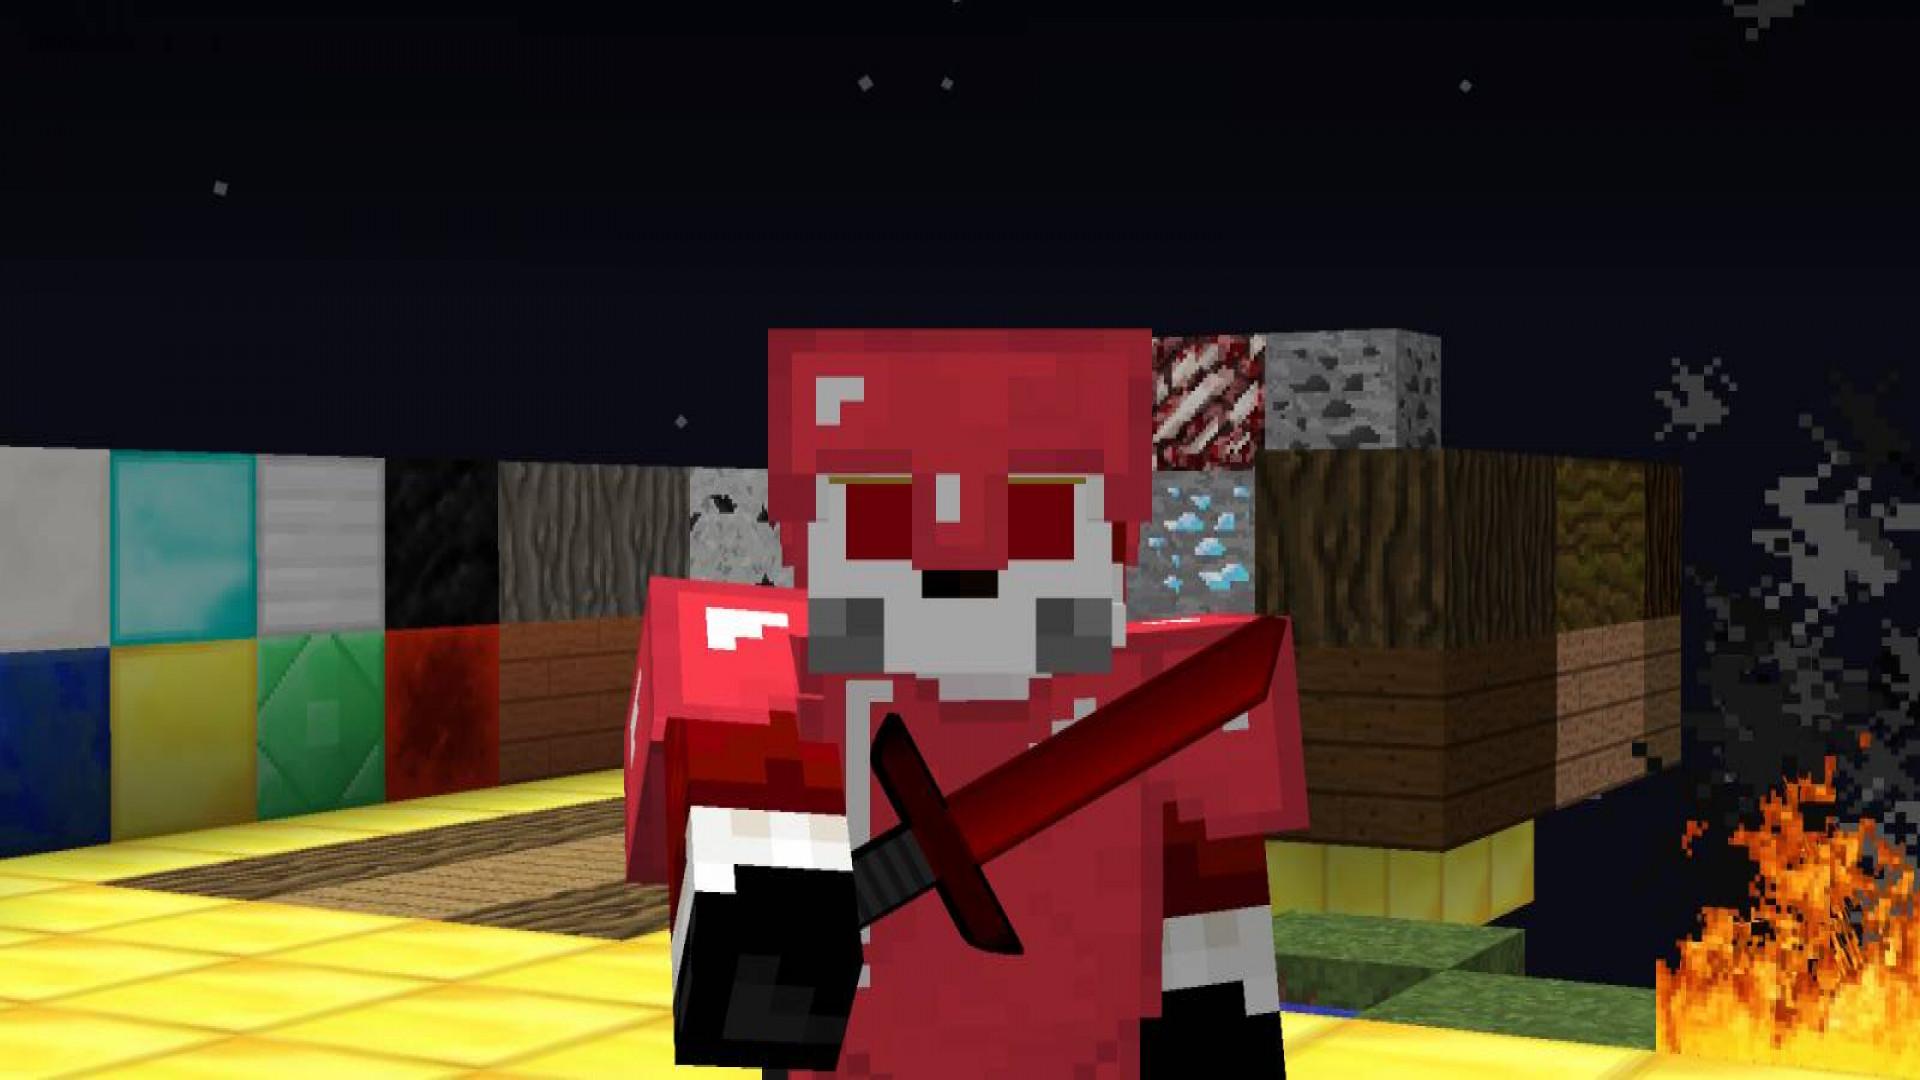 SkelettX1sFaithul